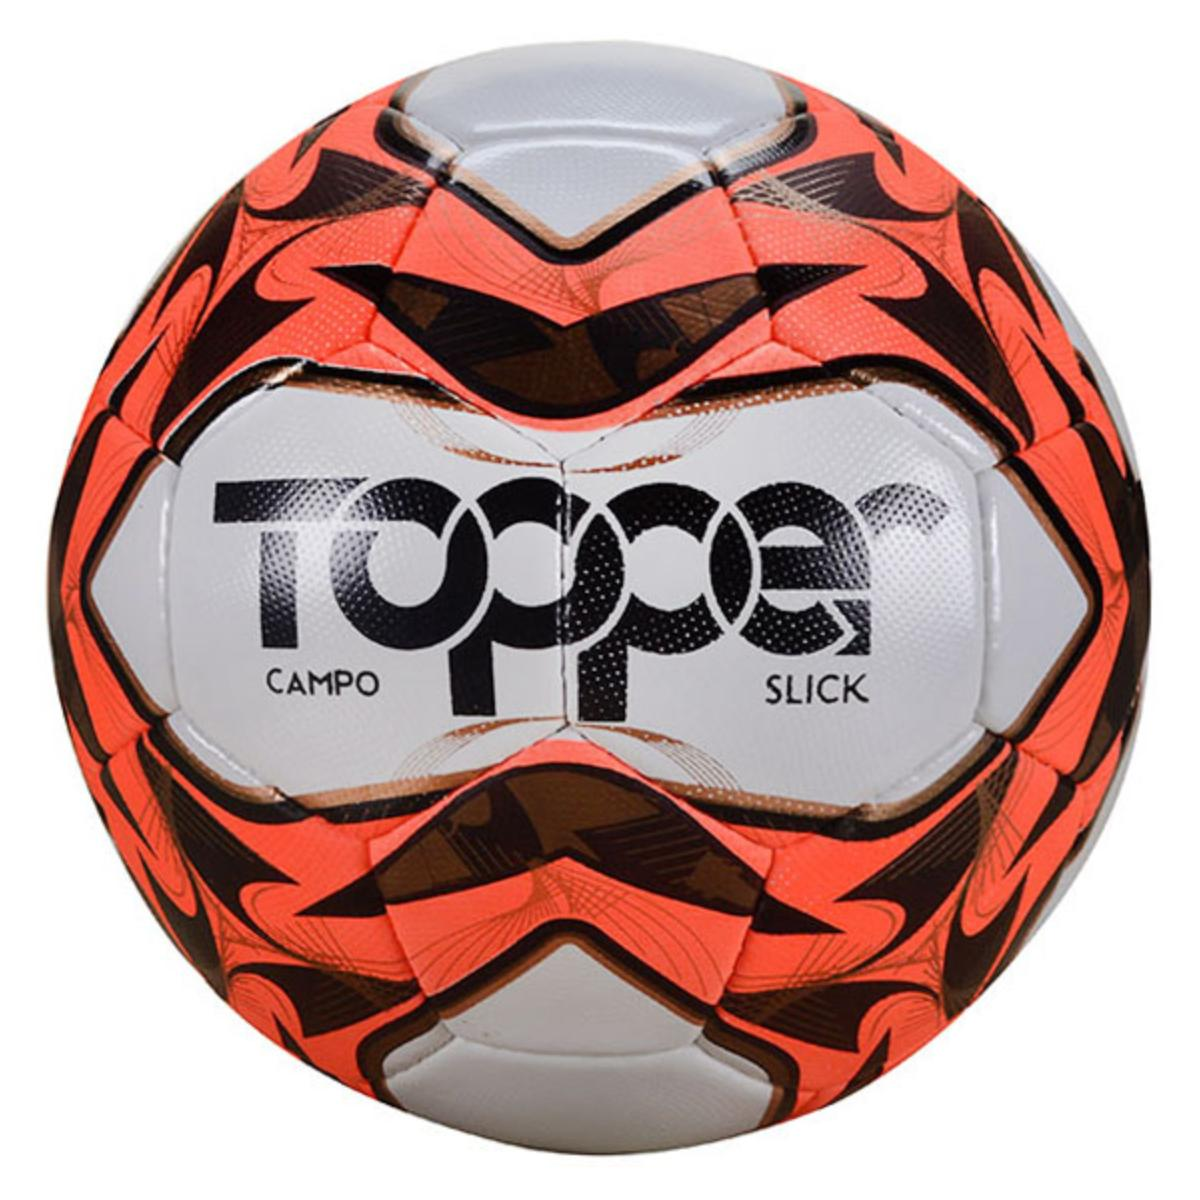 Bola Unisex Topper 32230019127 Cpo Slick Cost Branco/laranja/preto